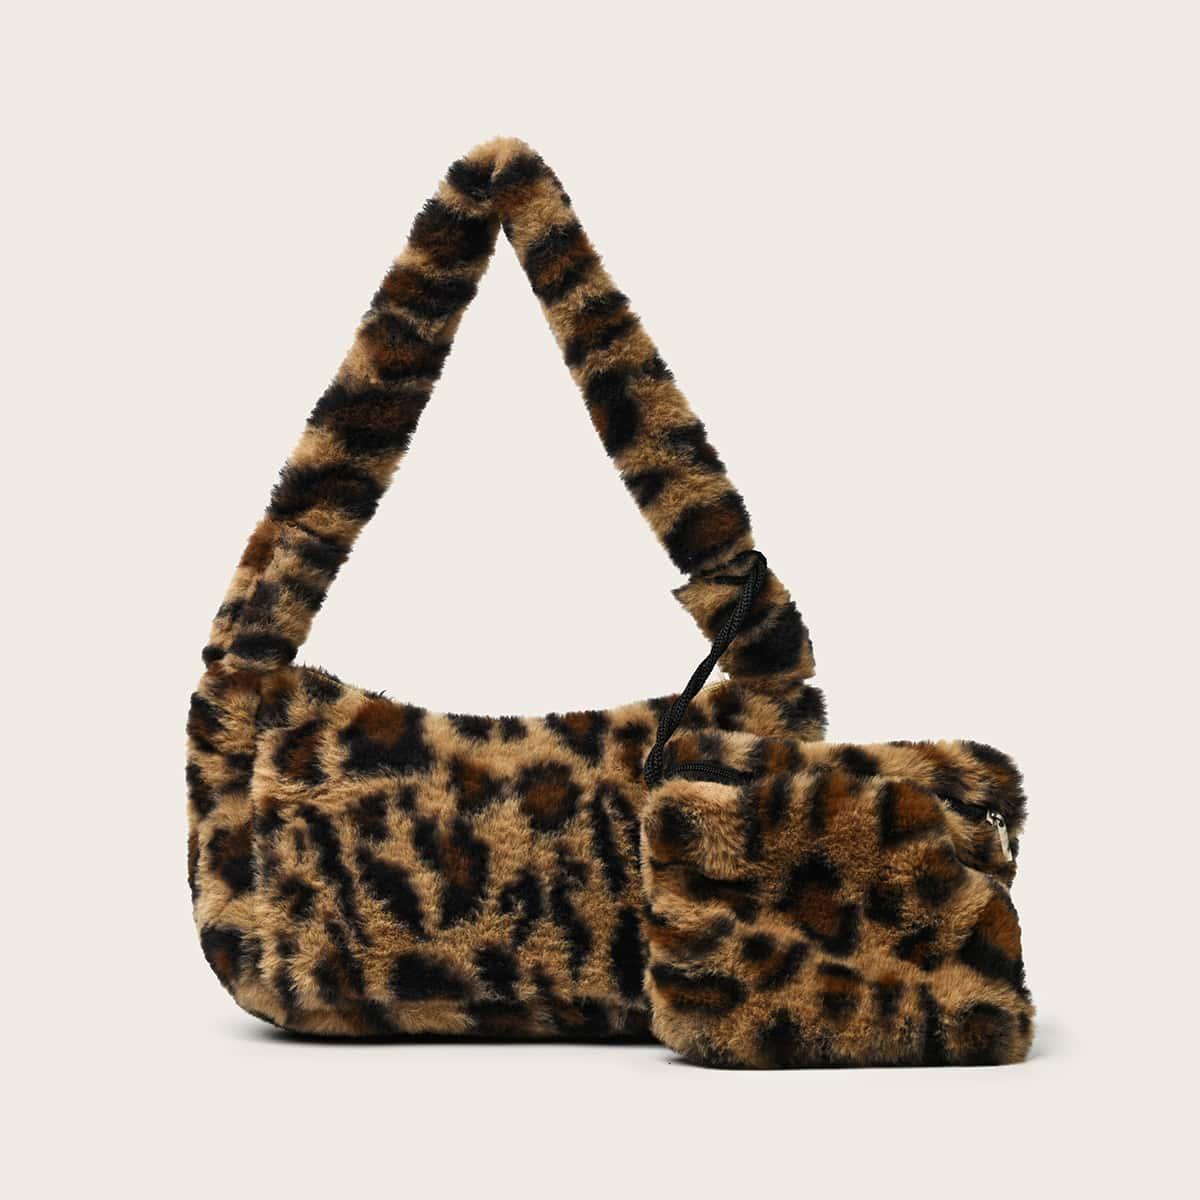 Leopard Fluffy Baguette Bag With Purse